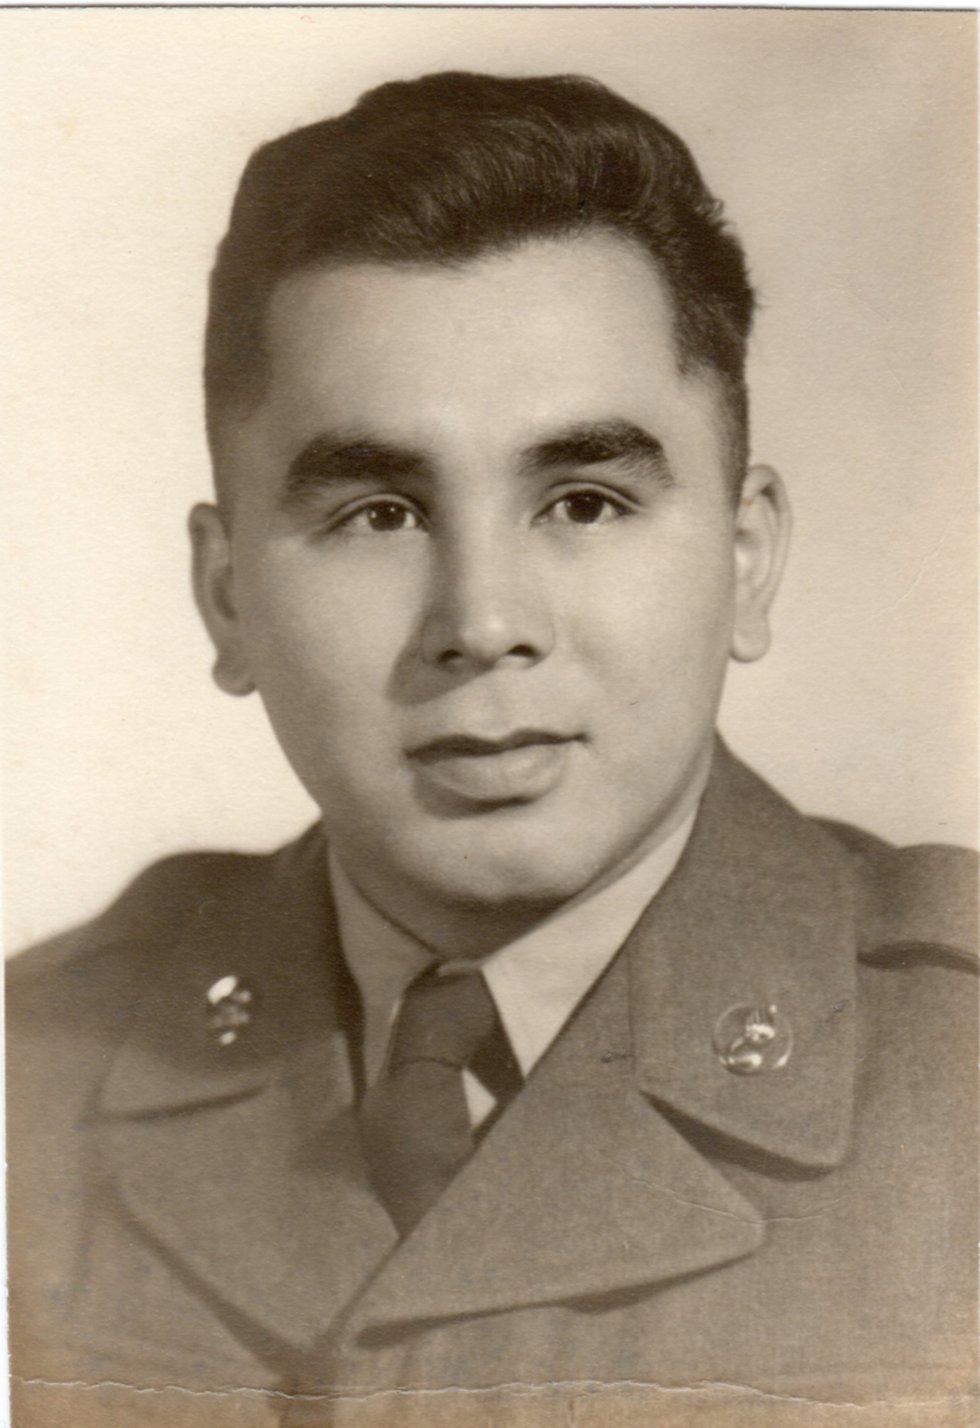 Portrait of Sgt. 1st Class Herber Alex. (Alaska National Guard Courtesy Photo)